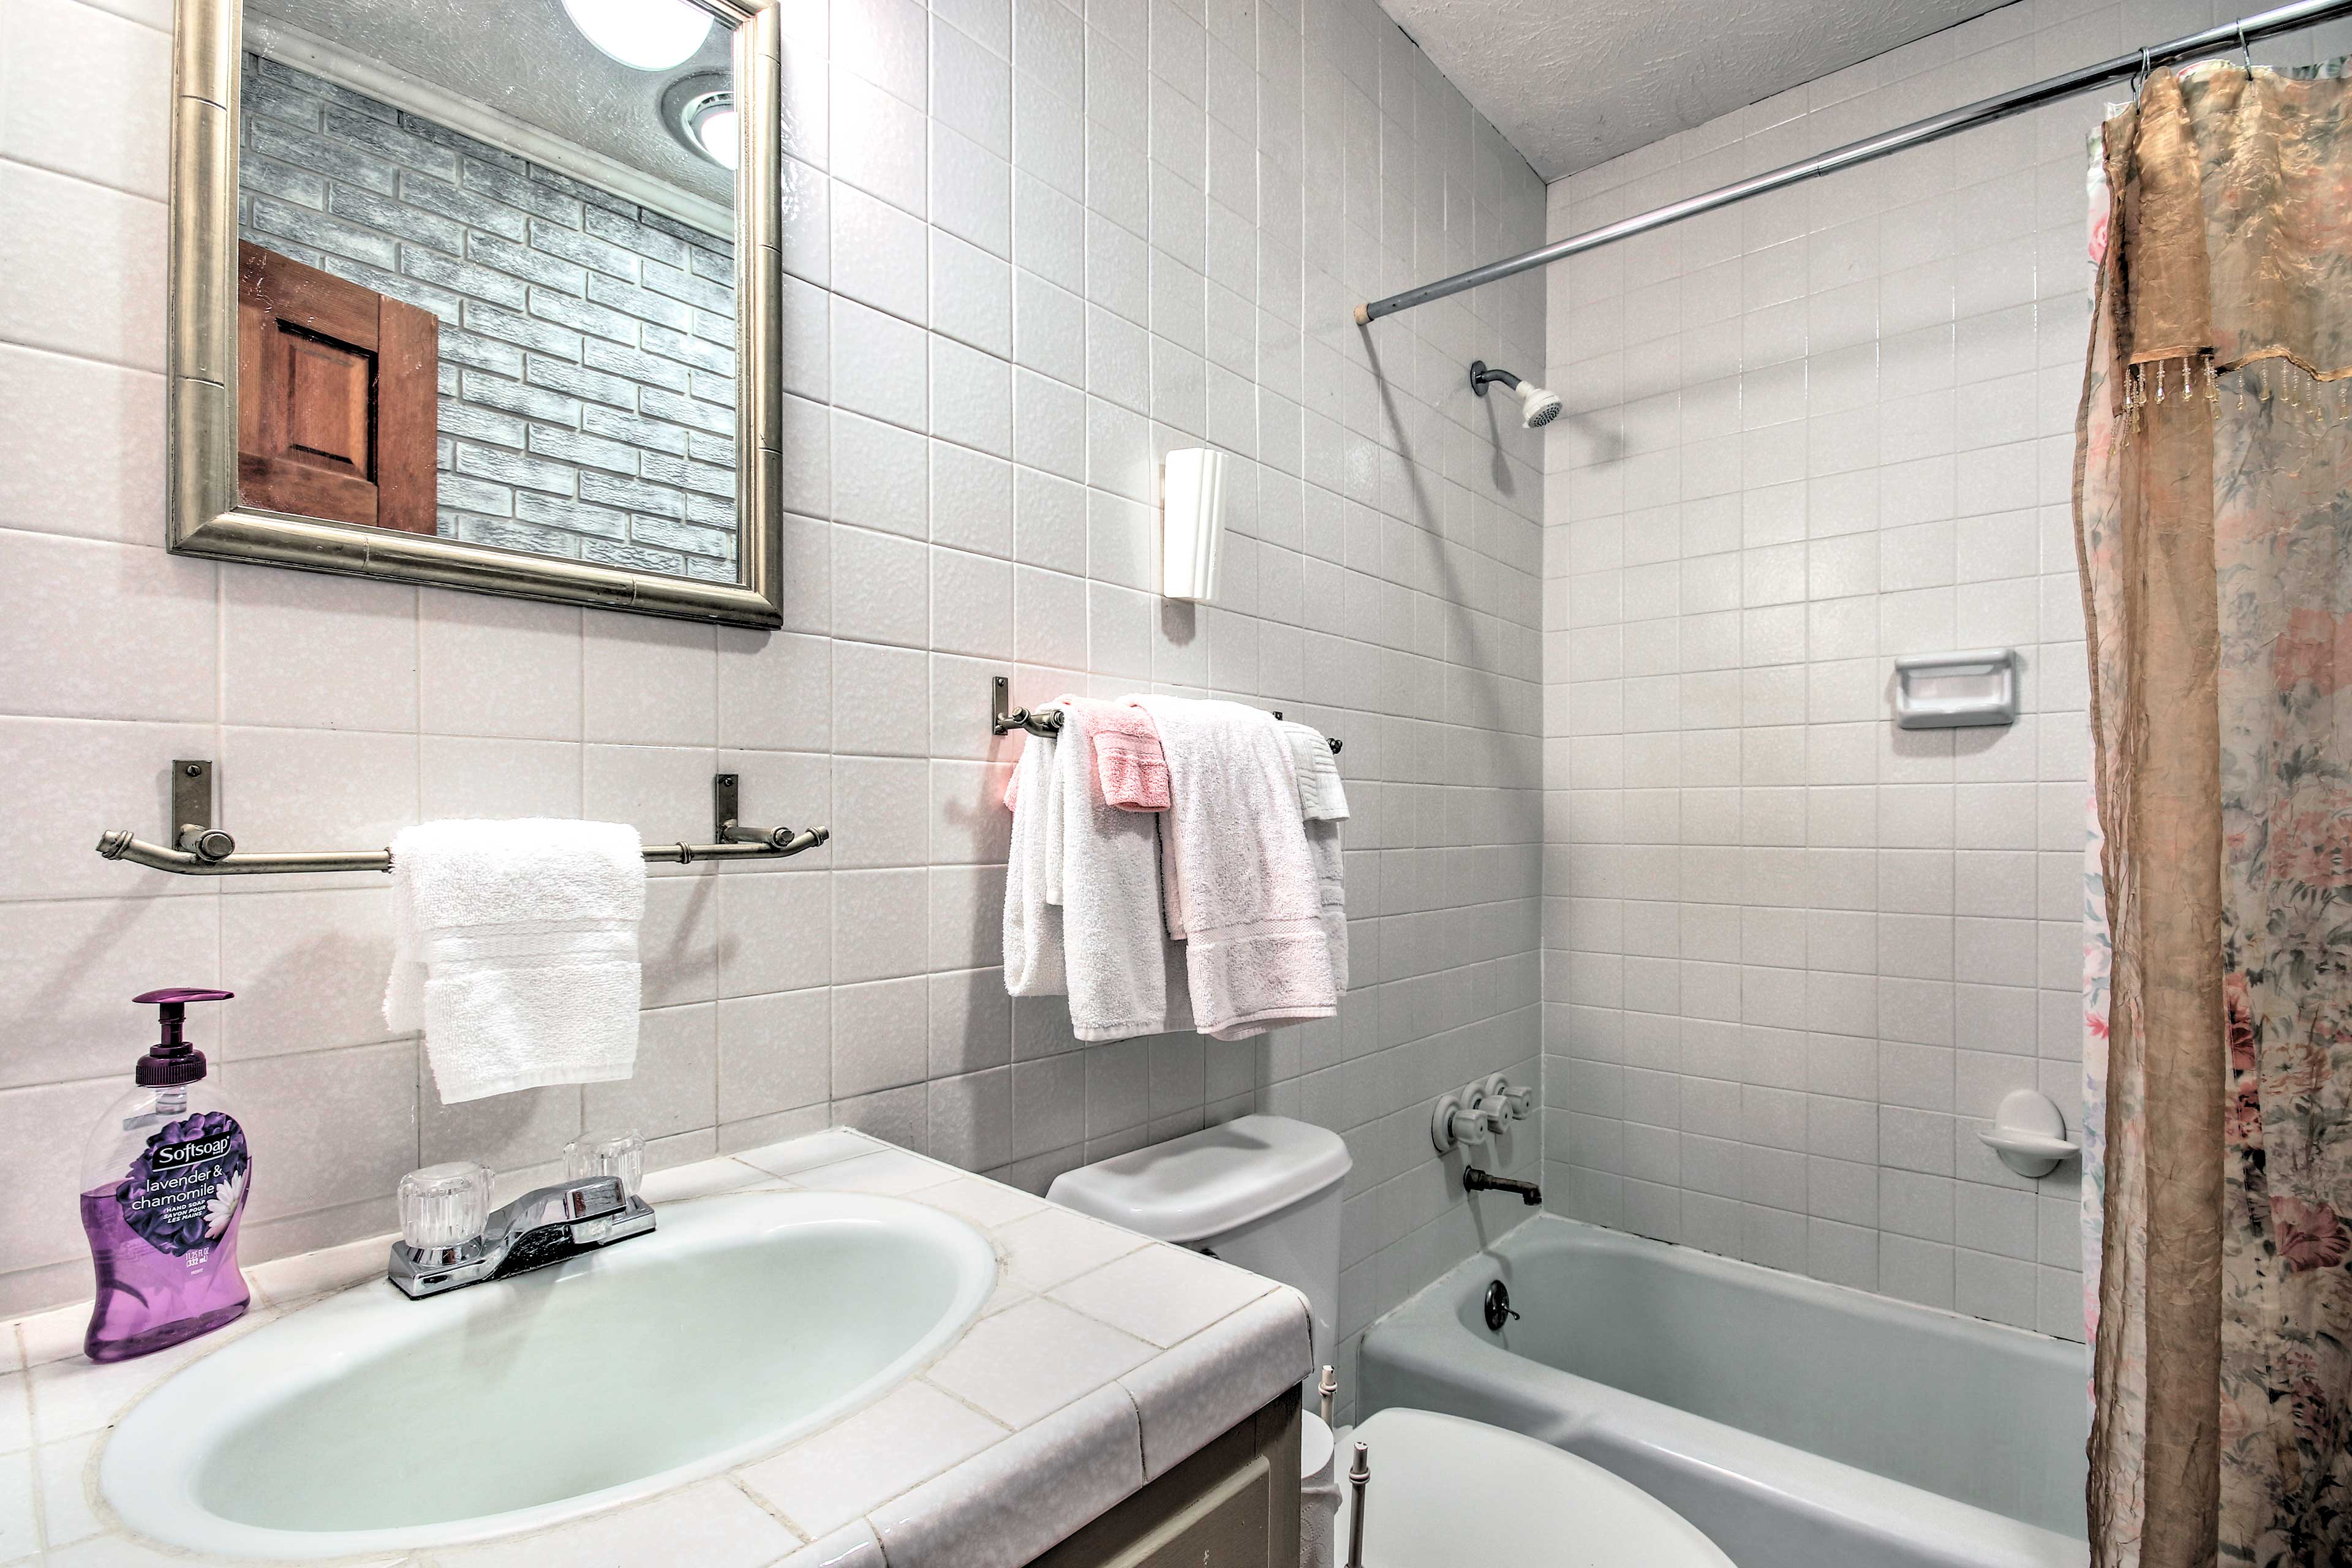 The final en-suite bathroom offers a shower/tub combo.